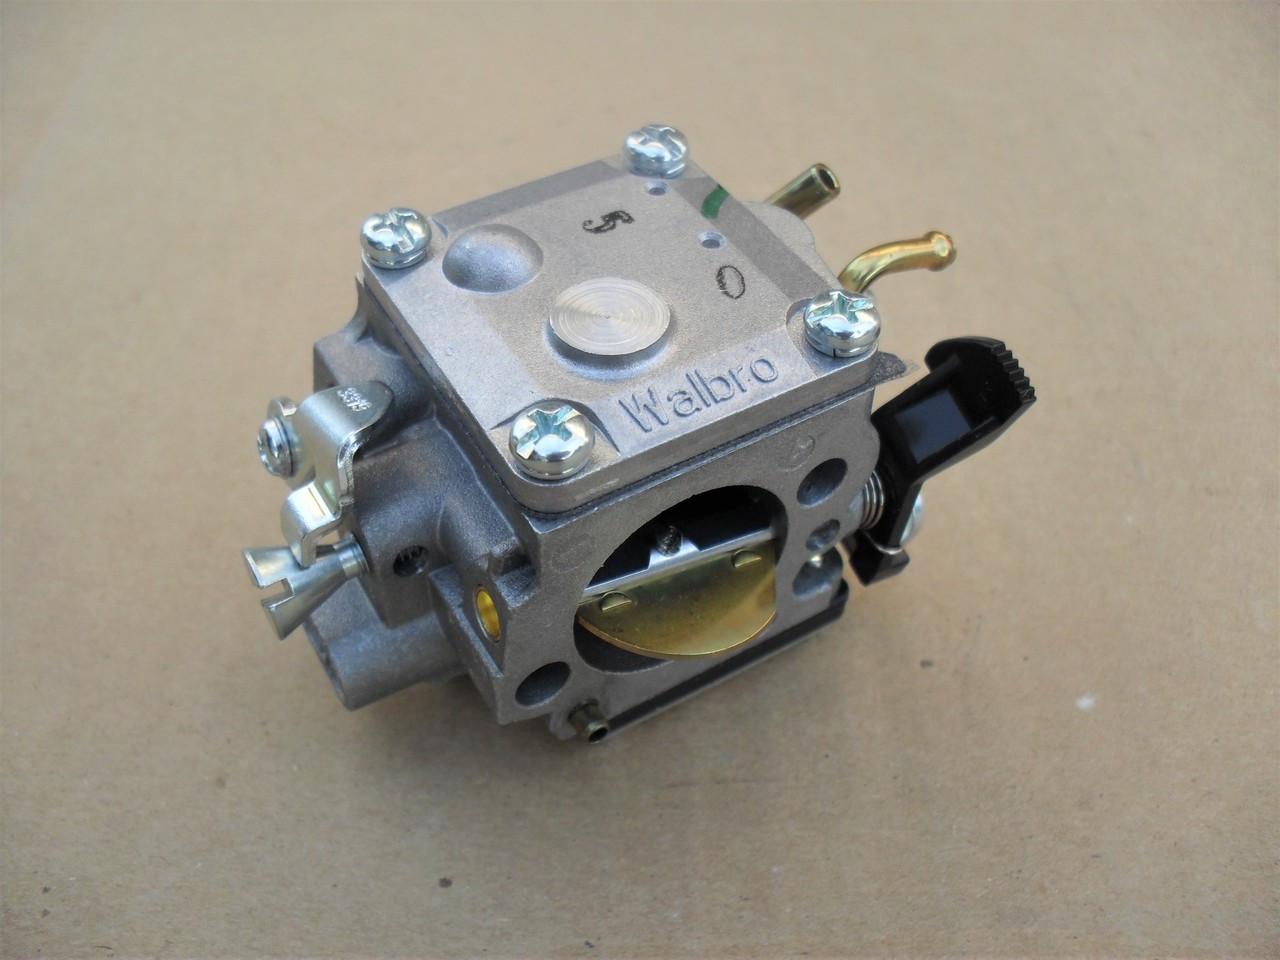 Carburetor for Red Max EXZ2401S BCZ2450S HEZ2401S LRTZ2401 SRTZ2401 848-F08-8101